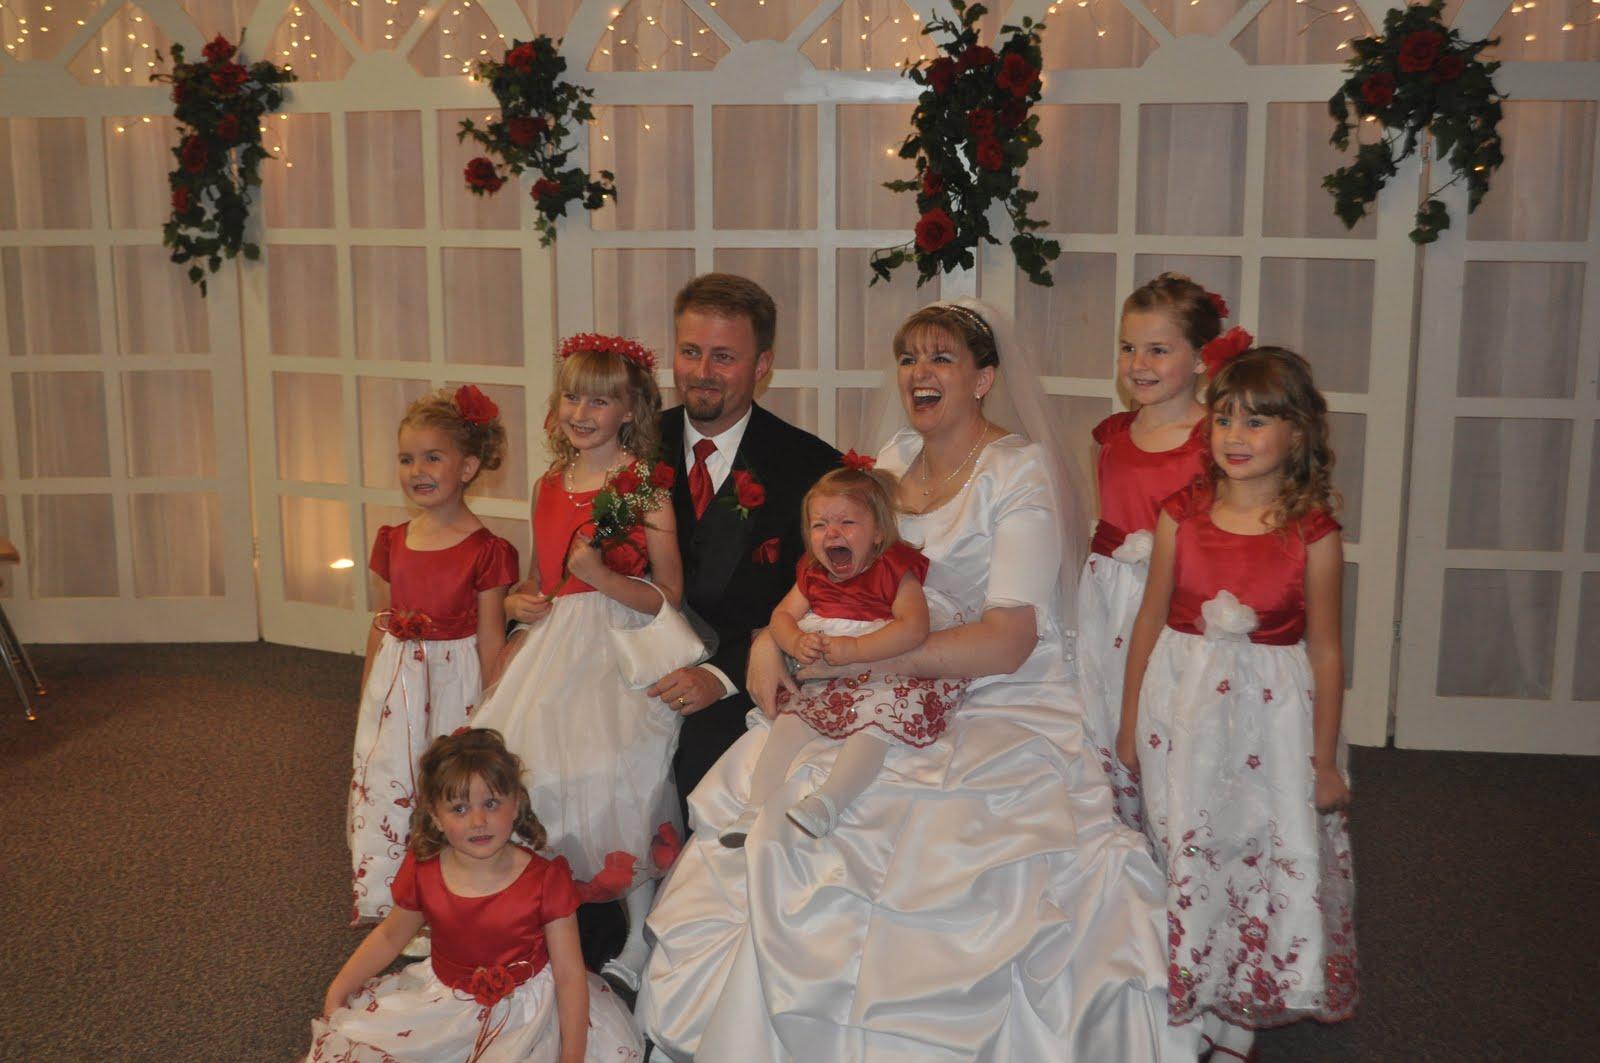 http://4.bp.blogspot.com/_iN8nY_Avlk0/TBalxCsDKLI/AAAAAAAAAPw/jYUB-nB5gXA/s1600/wedding+102.jpg